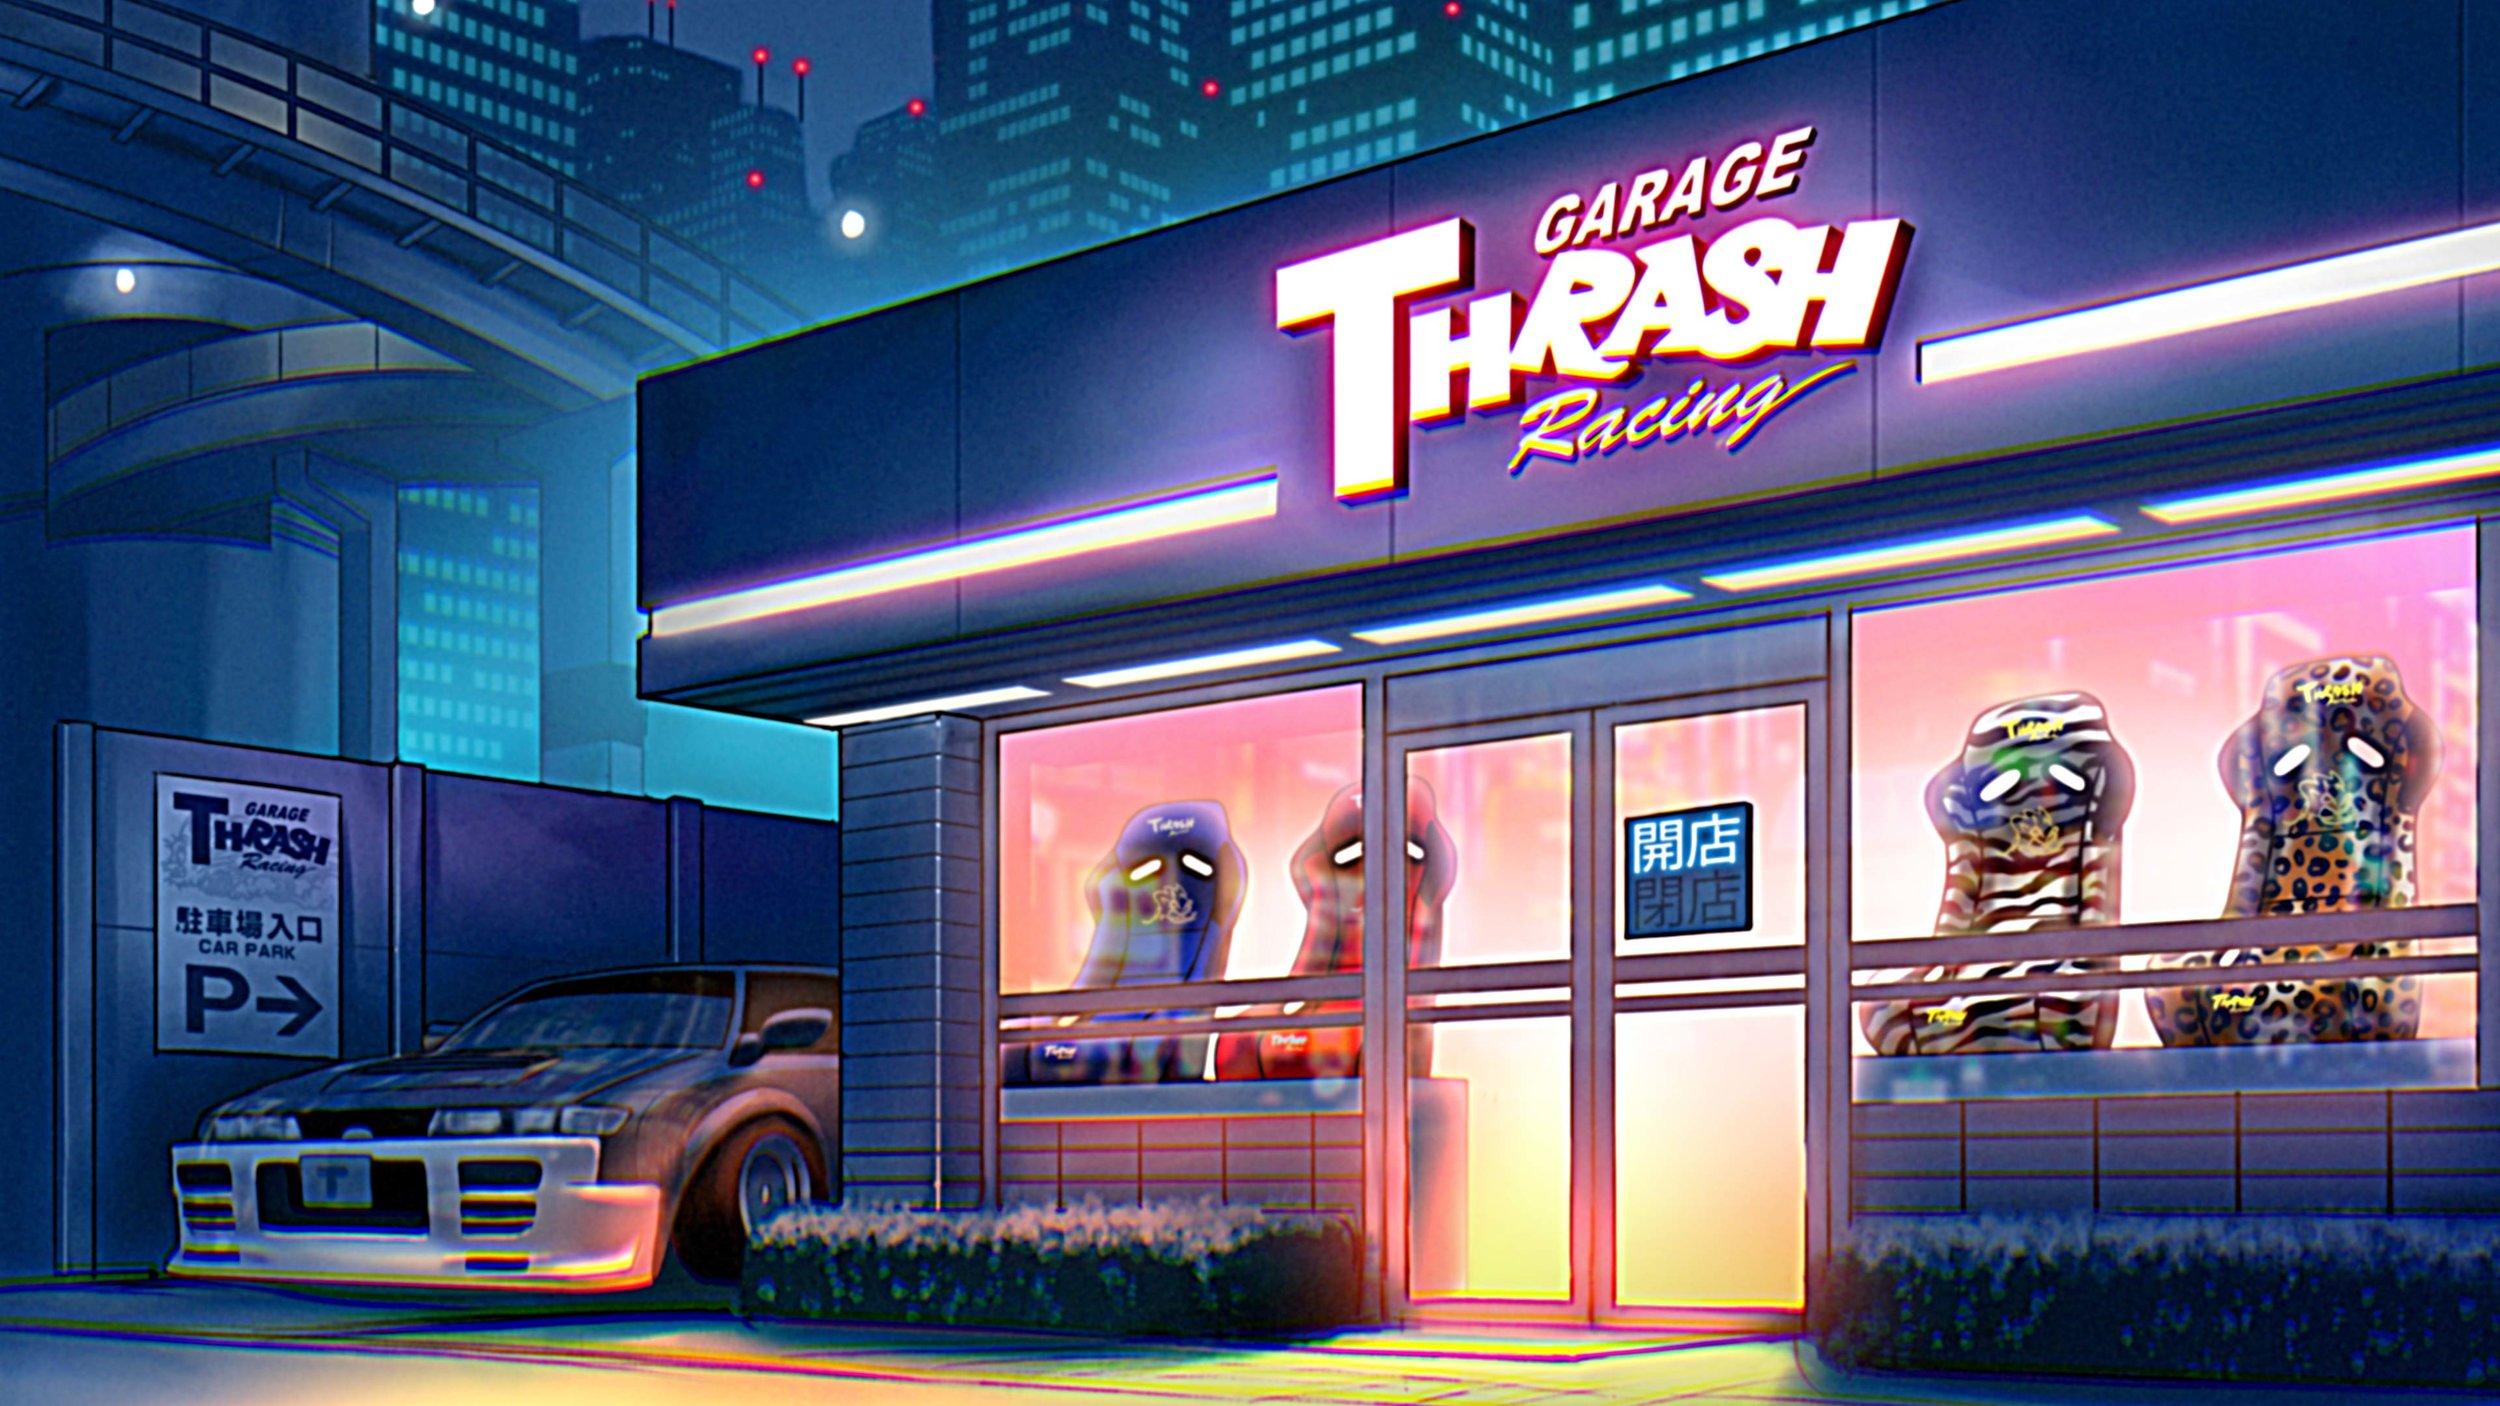 Thrash Open